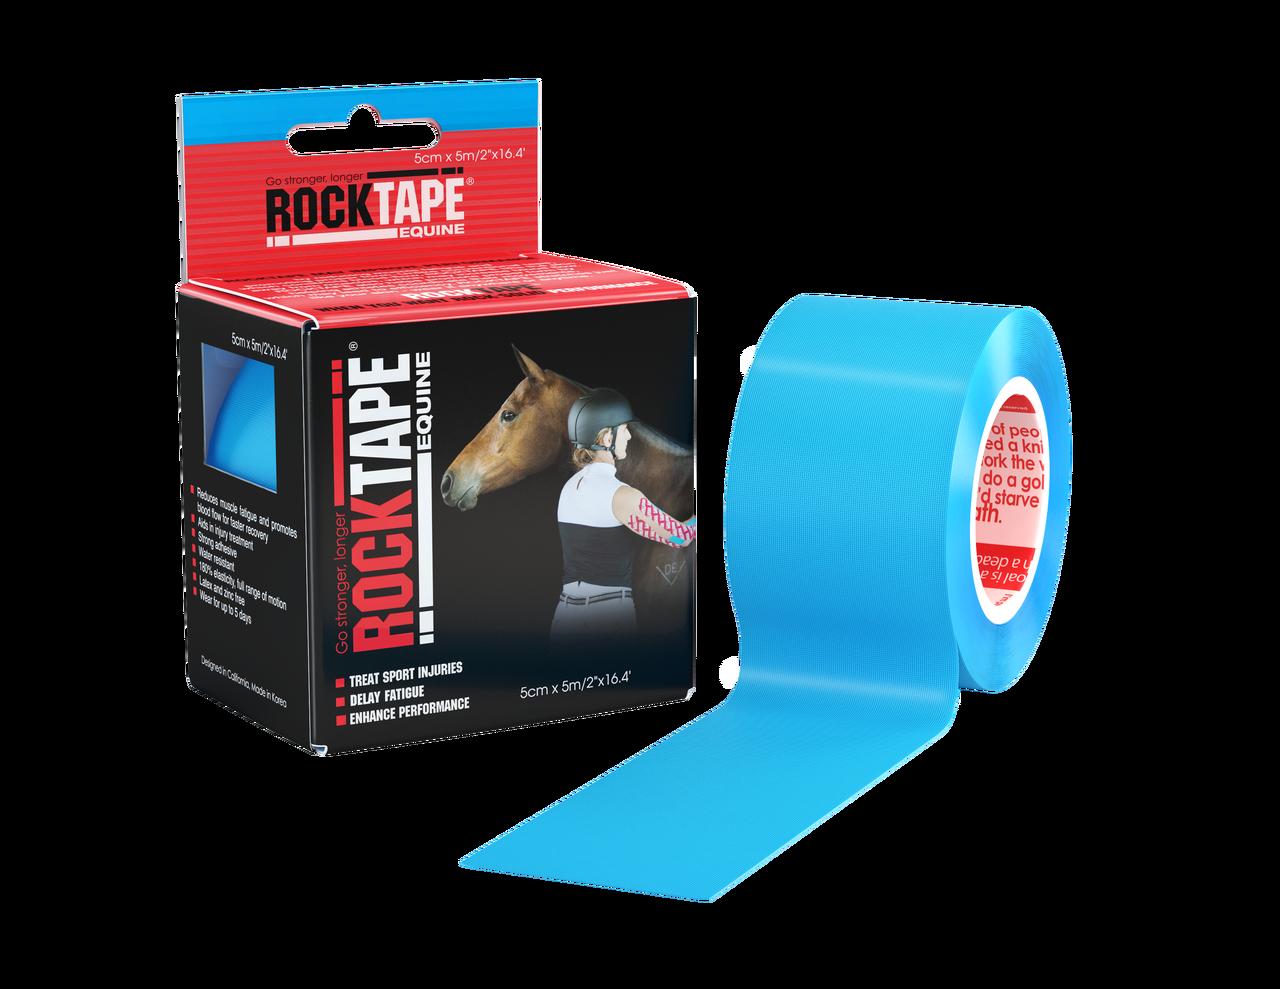 RockTape, Equine, 5см×5м, голубой